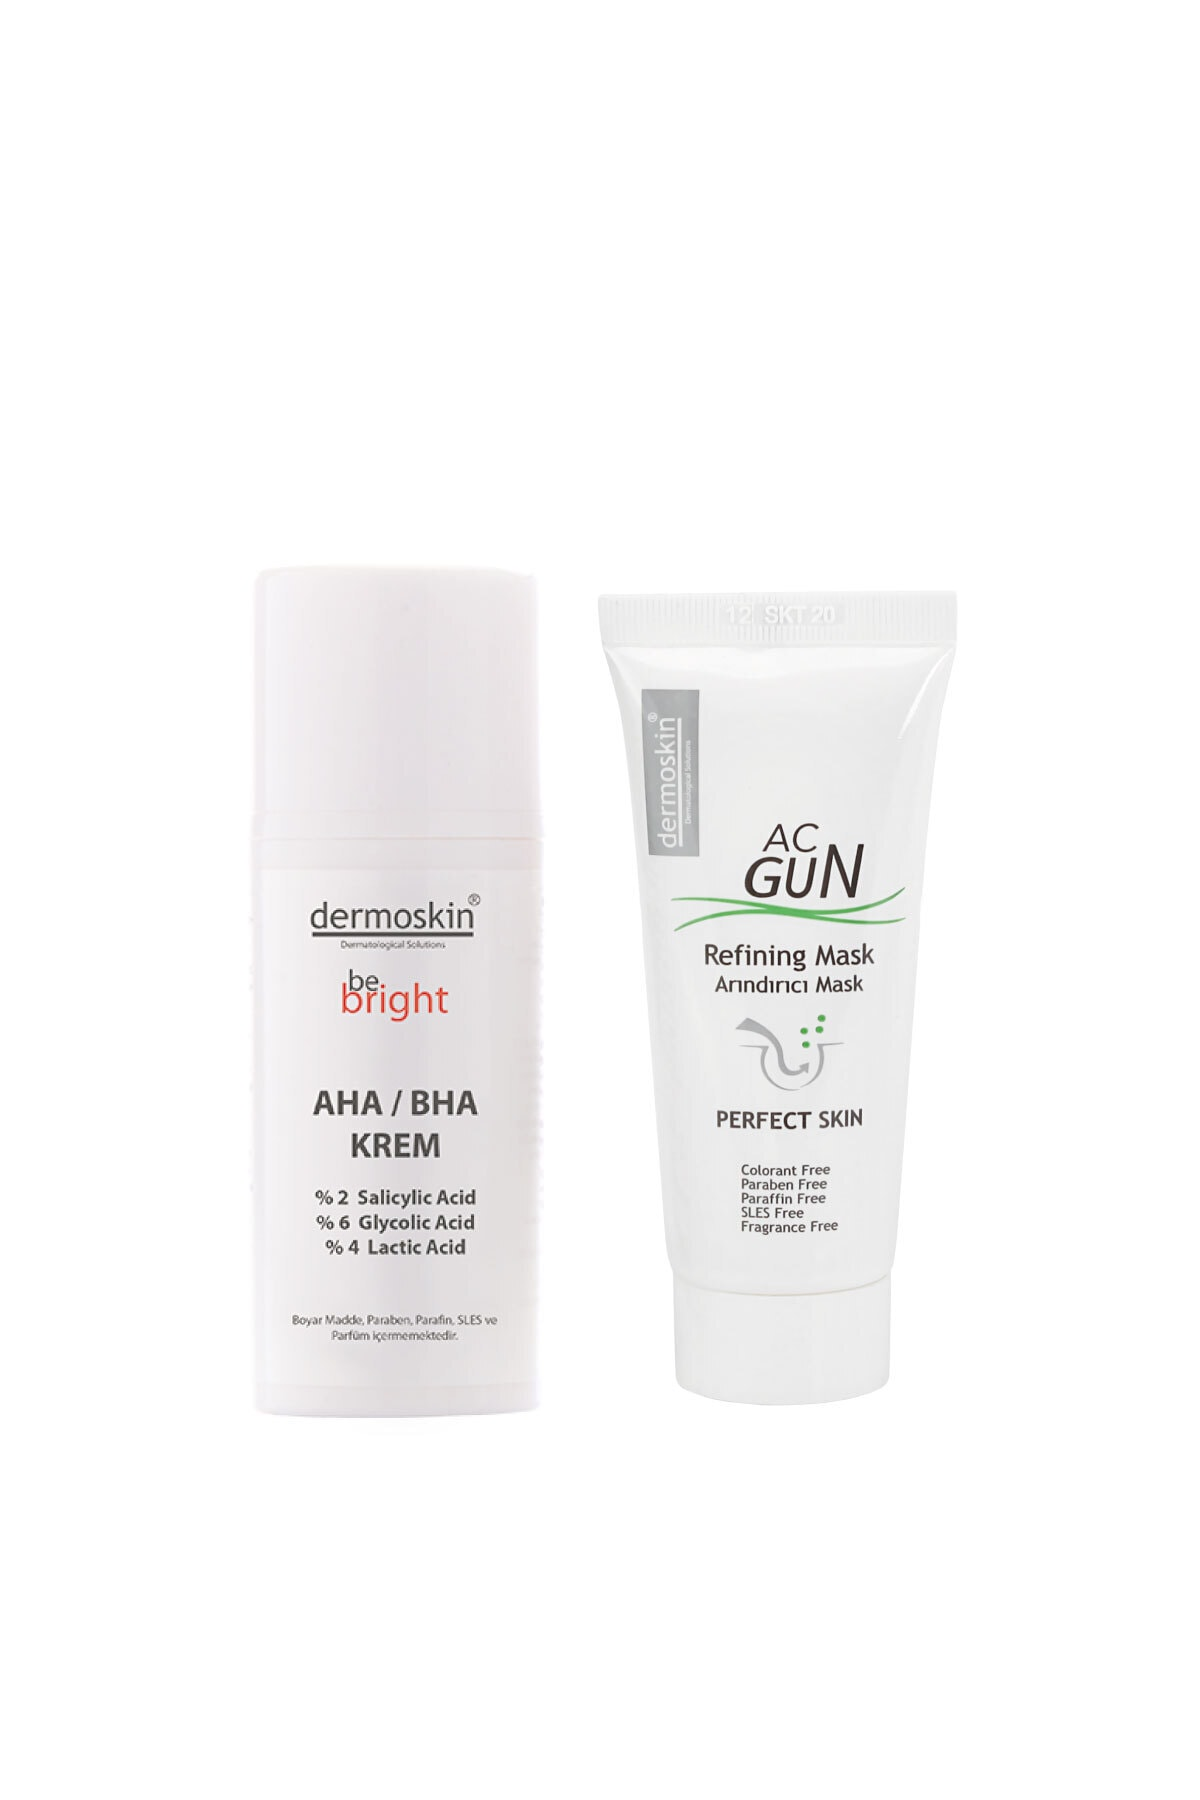 Dermoskin Be Bright Aha Bha Krem 33 Ml + Acgun Arındırıcı Mask 30 Ml 2'li Avantaj Paket 1